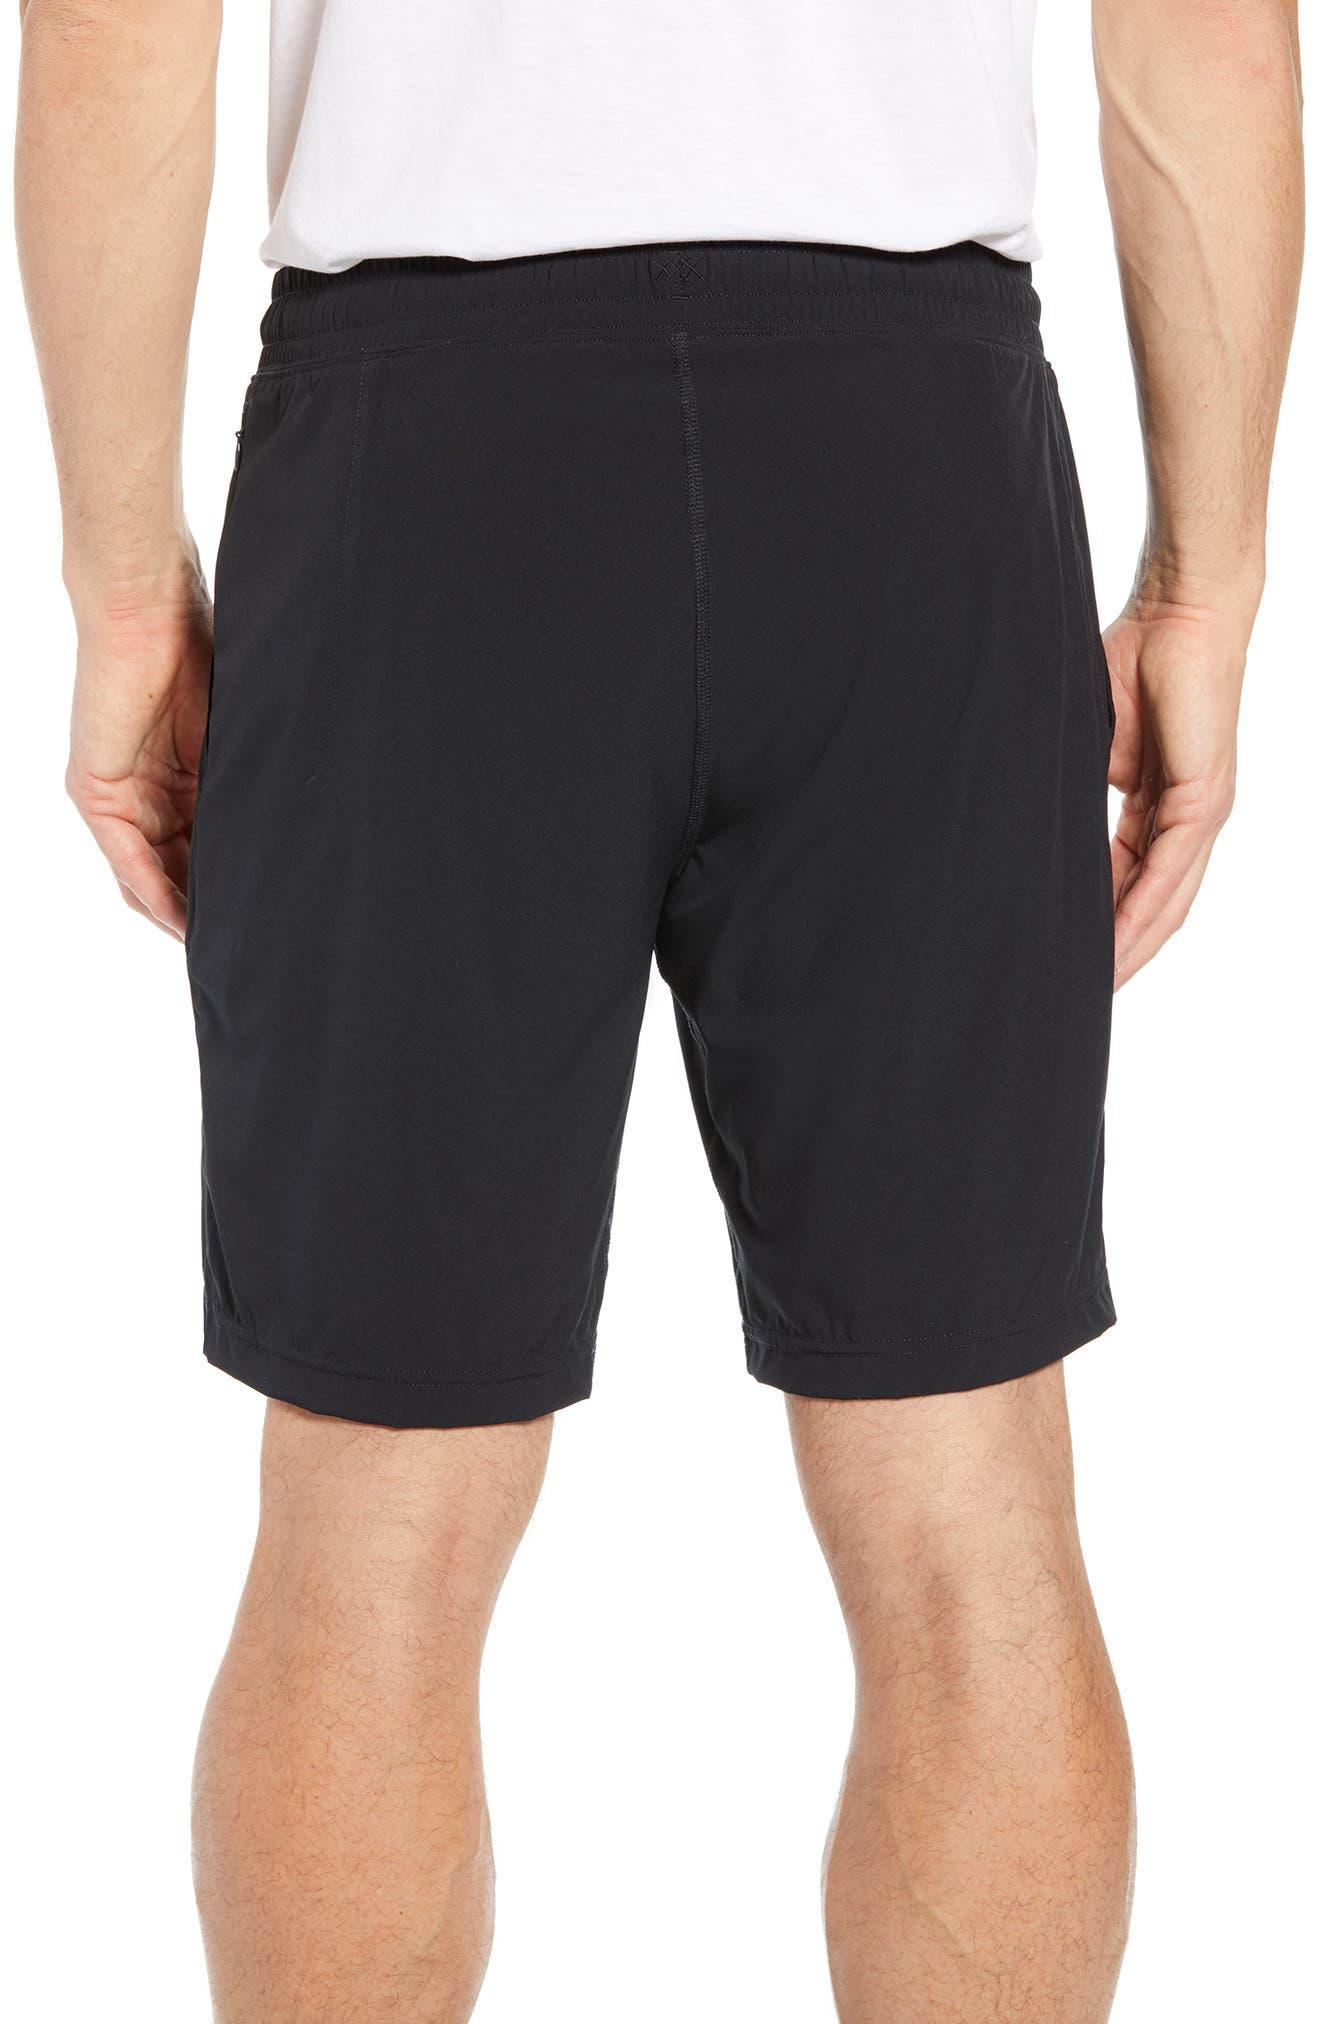 RHONE, Mako Lined Shorts, Alternate thumbnail 2, color, BLACK